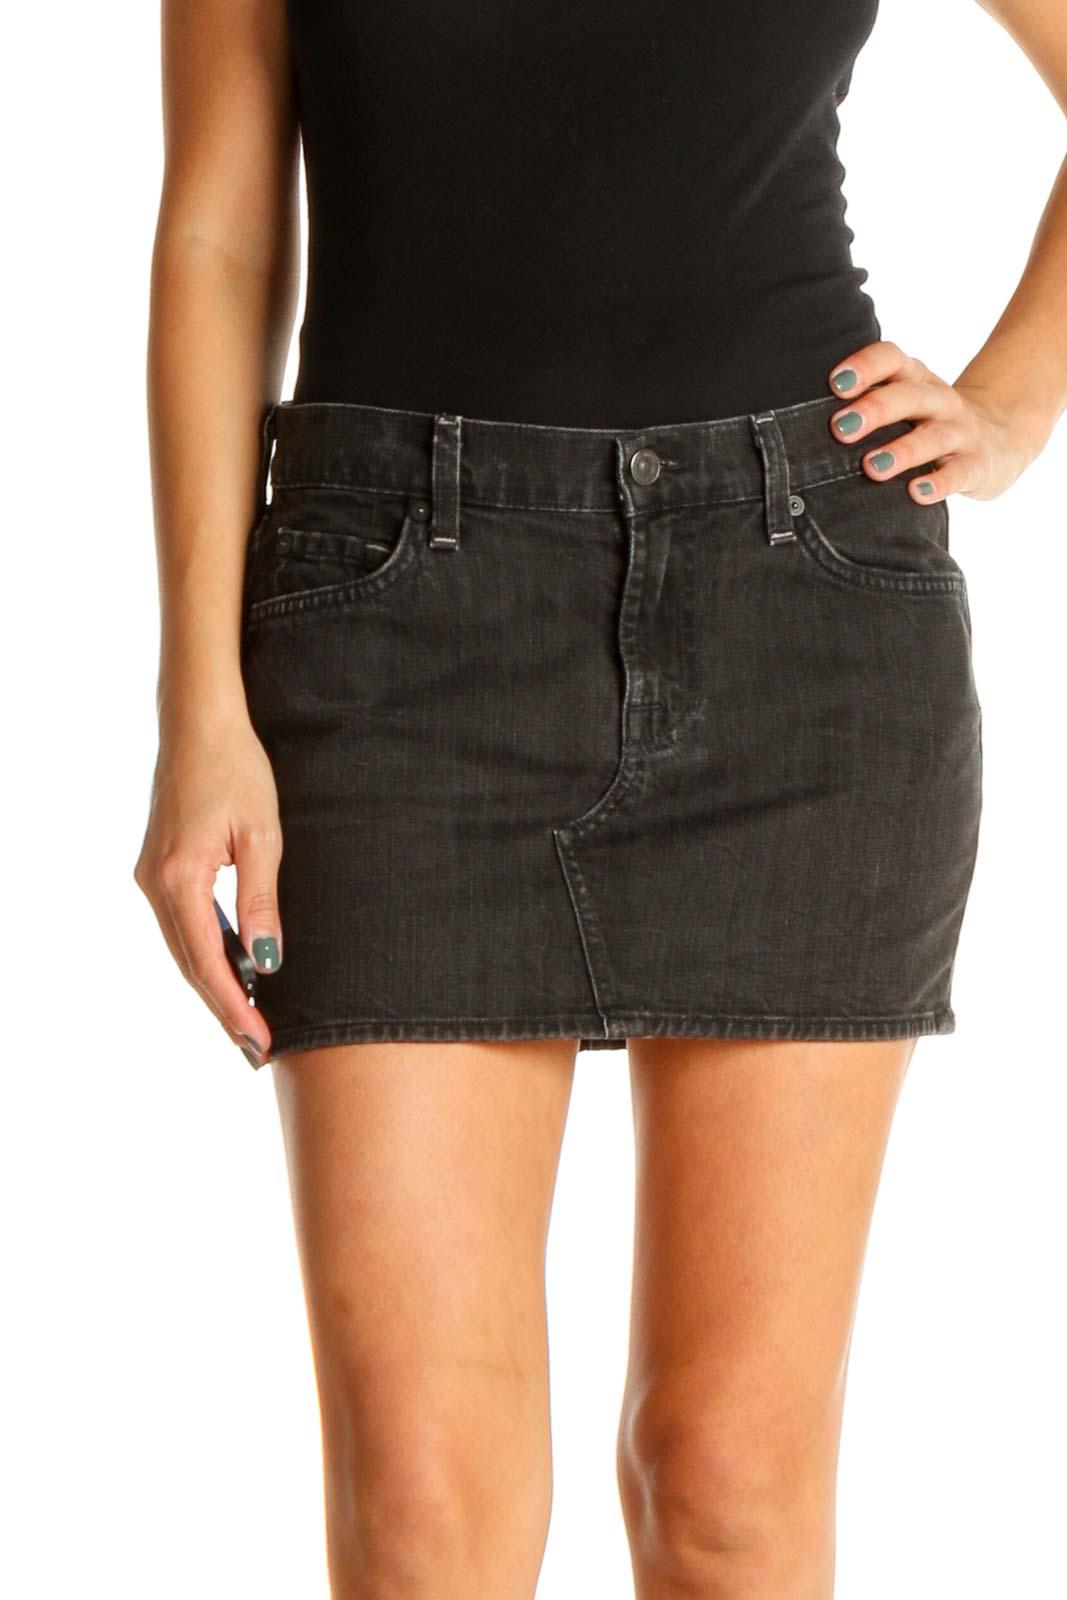 Black Chic Denim Mini Skirt Front